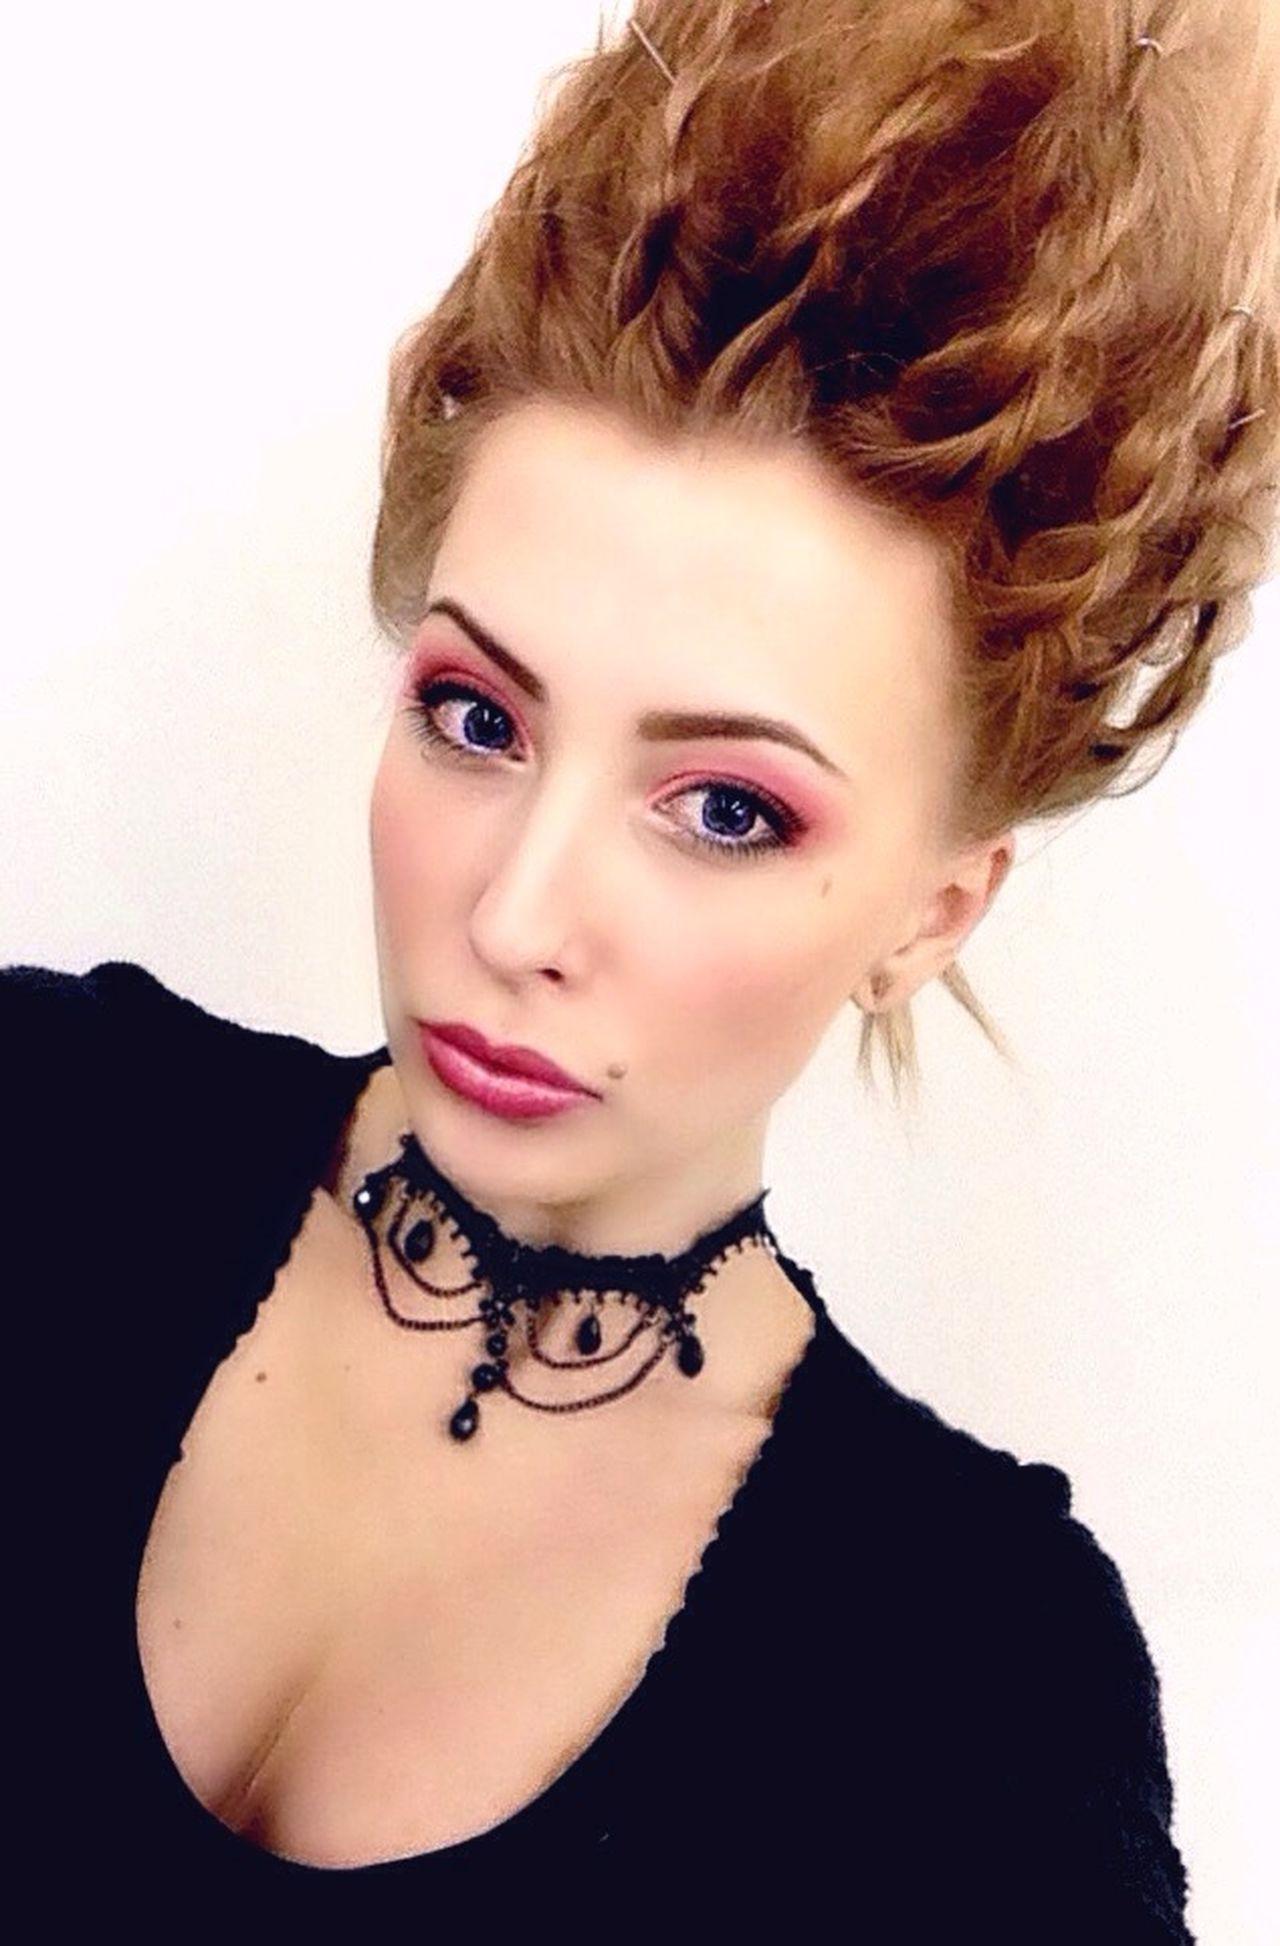 Portrait Beauty Make-up Fashion Pink Romantic Doll Dollface Big Eyes Pale Skin Fetish Rococo